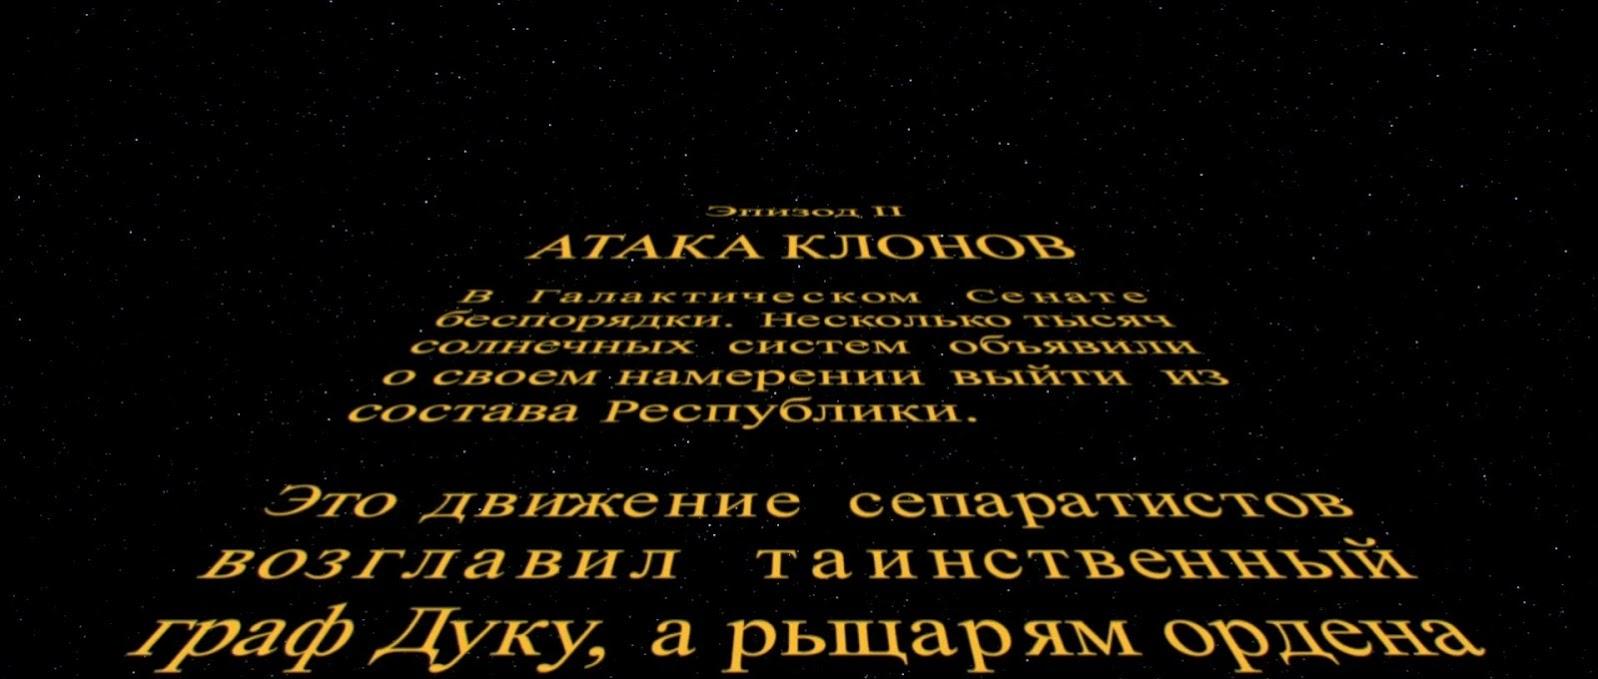 Звездные войны 2 1080p 60fps.mkv_snapshot_00.01.06_[2015.02.18_15.36.21]